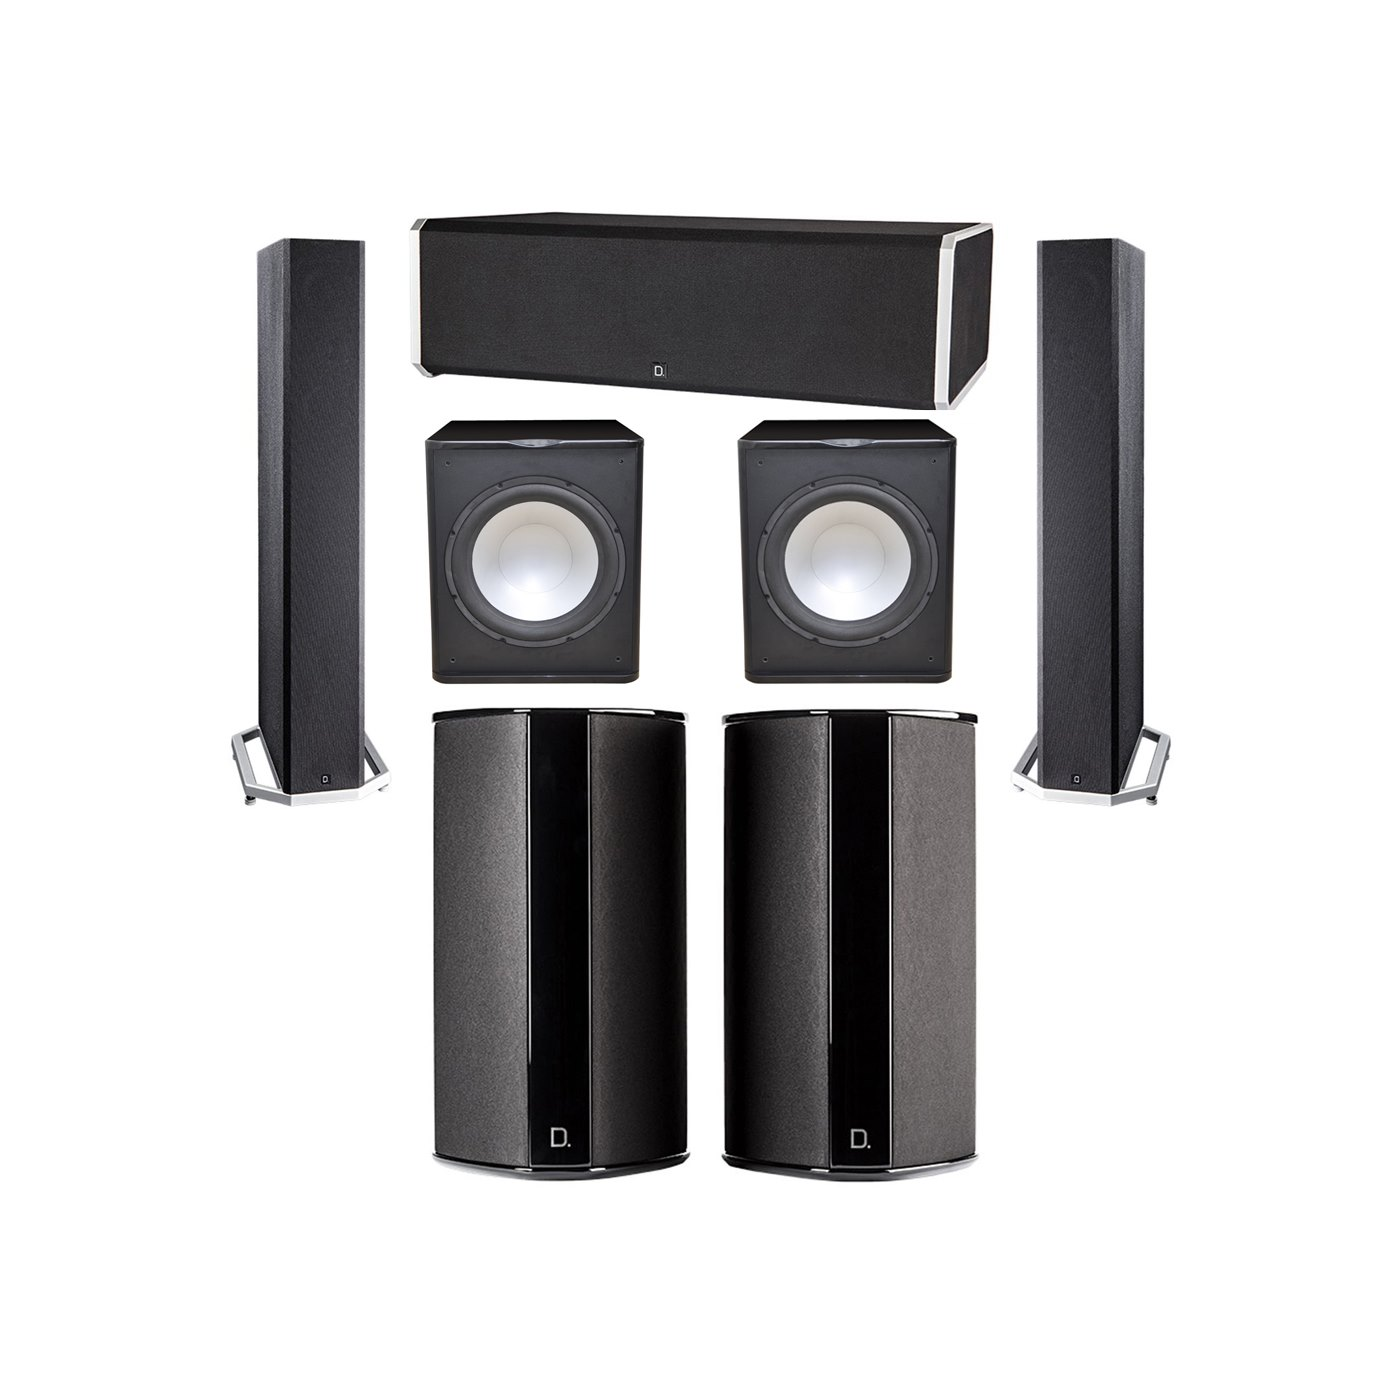 Definitive Technology 5.2 System with 2 BP9040 Tower Speakers, 1 CS9080 Center Channel Speaker, 2 SR9080 Surround Speaker, 2 Premier Acoustic PA-150 Subwoofer